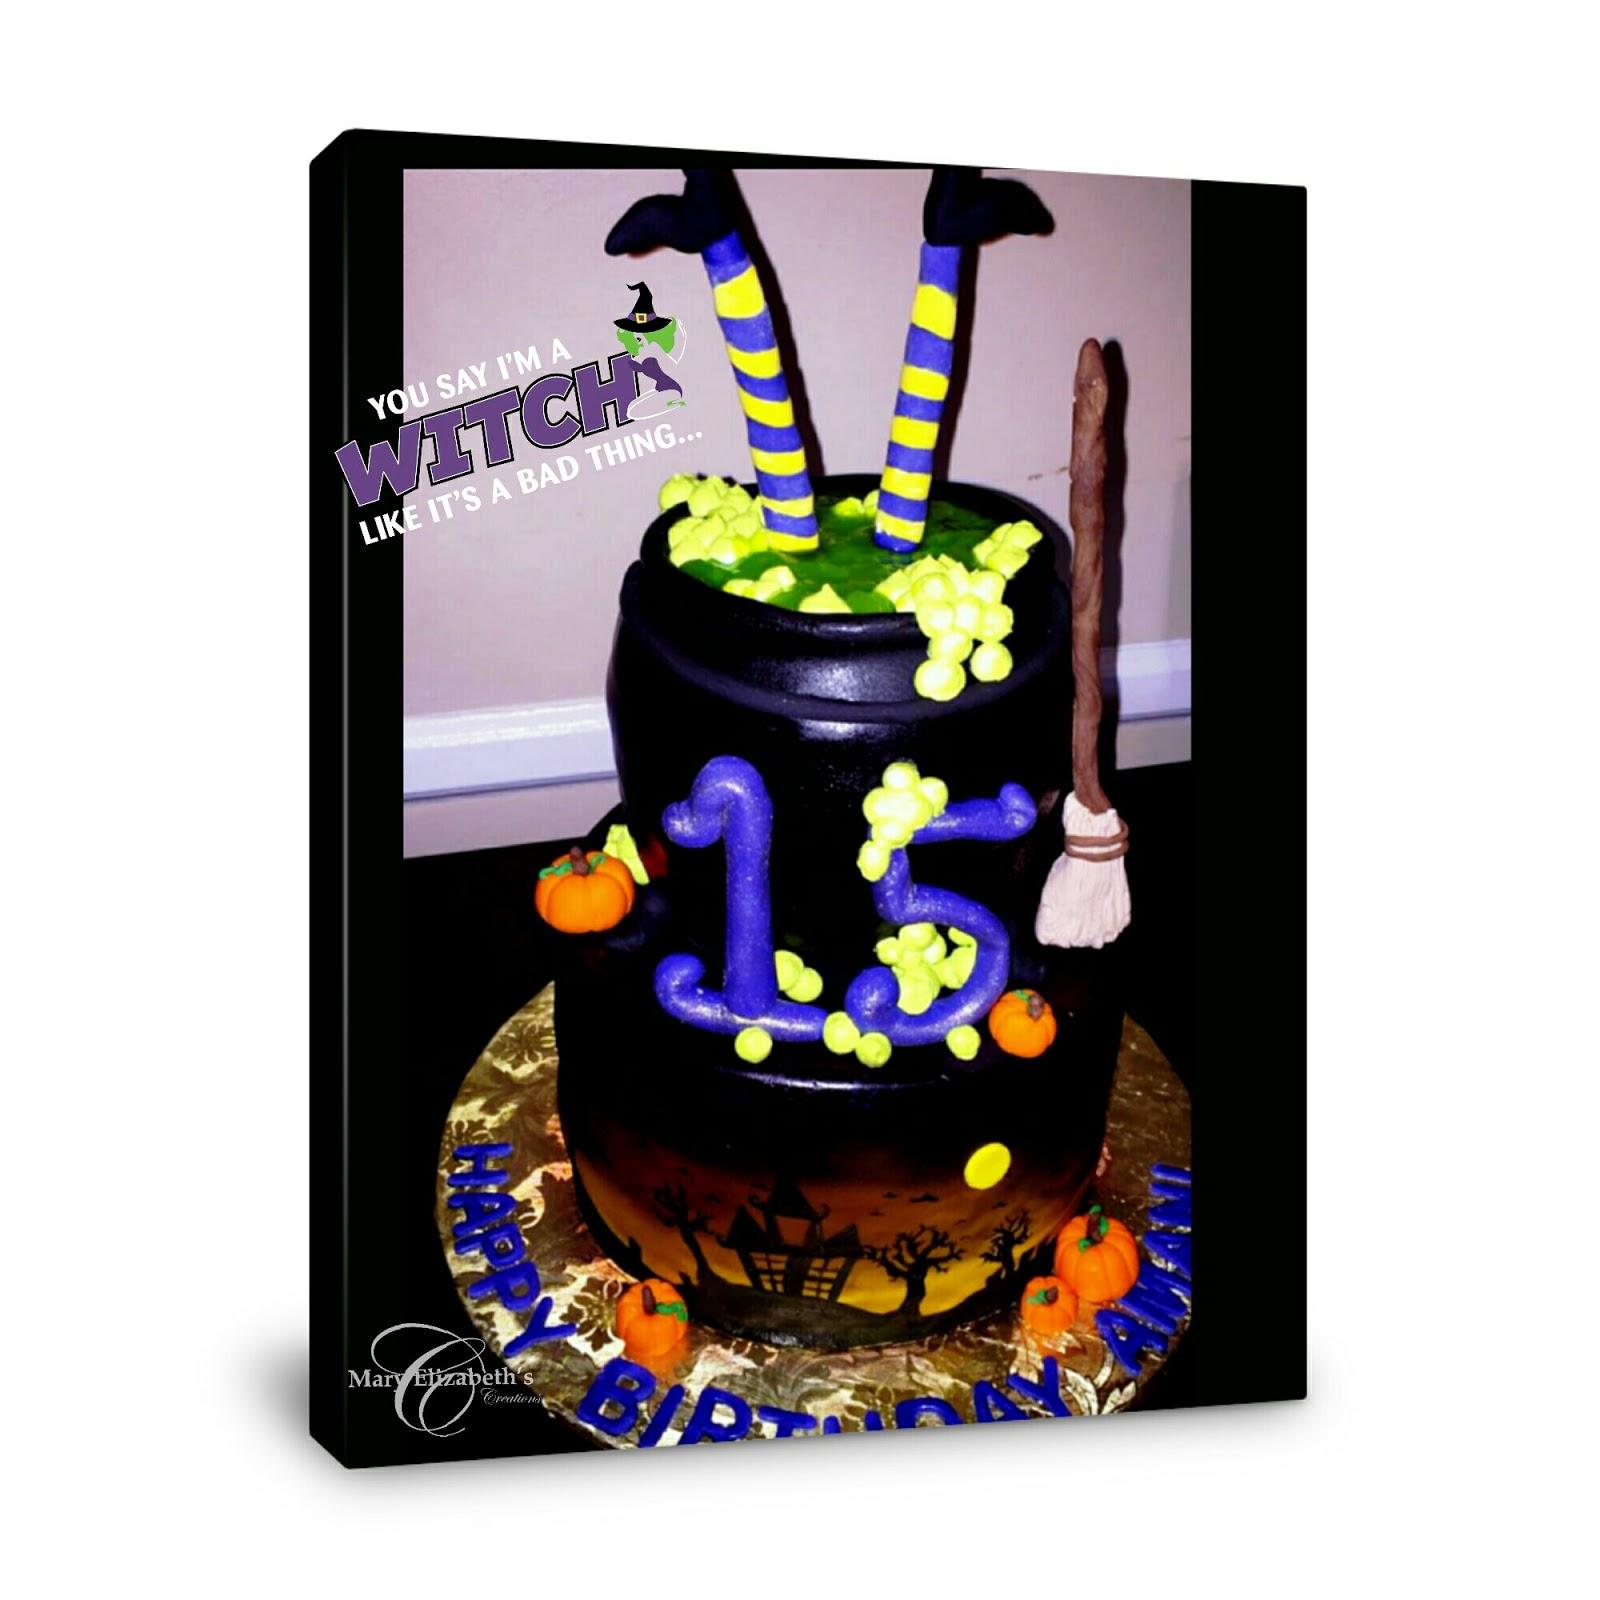 Sensational Mary Elizabeths Creations Halloween Themed Cake 4 Birthday Cake Funny Birthday Cards Online Fluifree Goldxyz